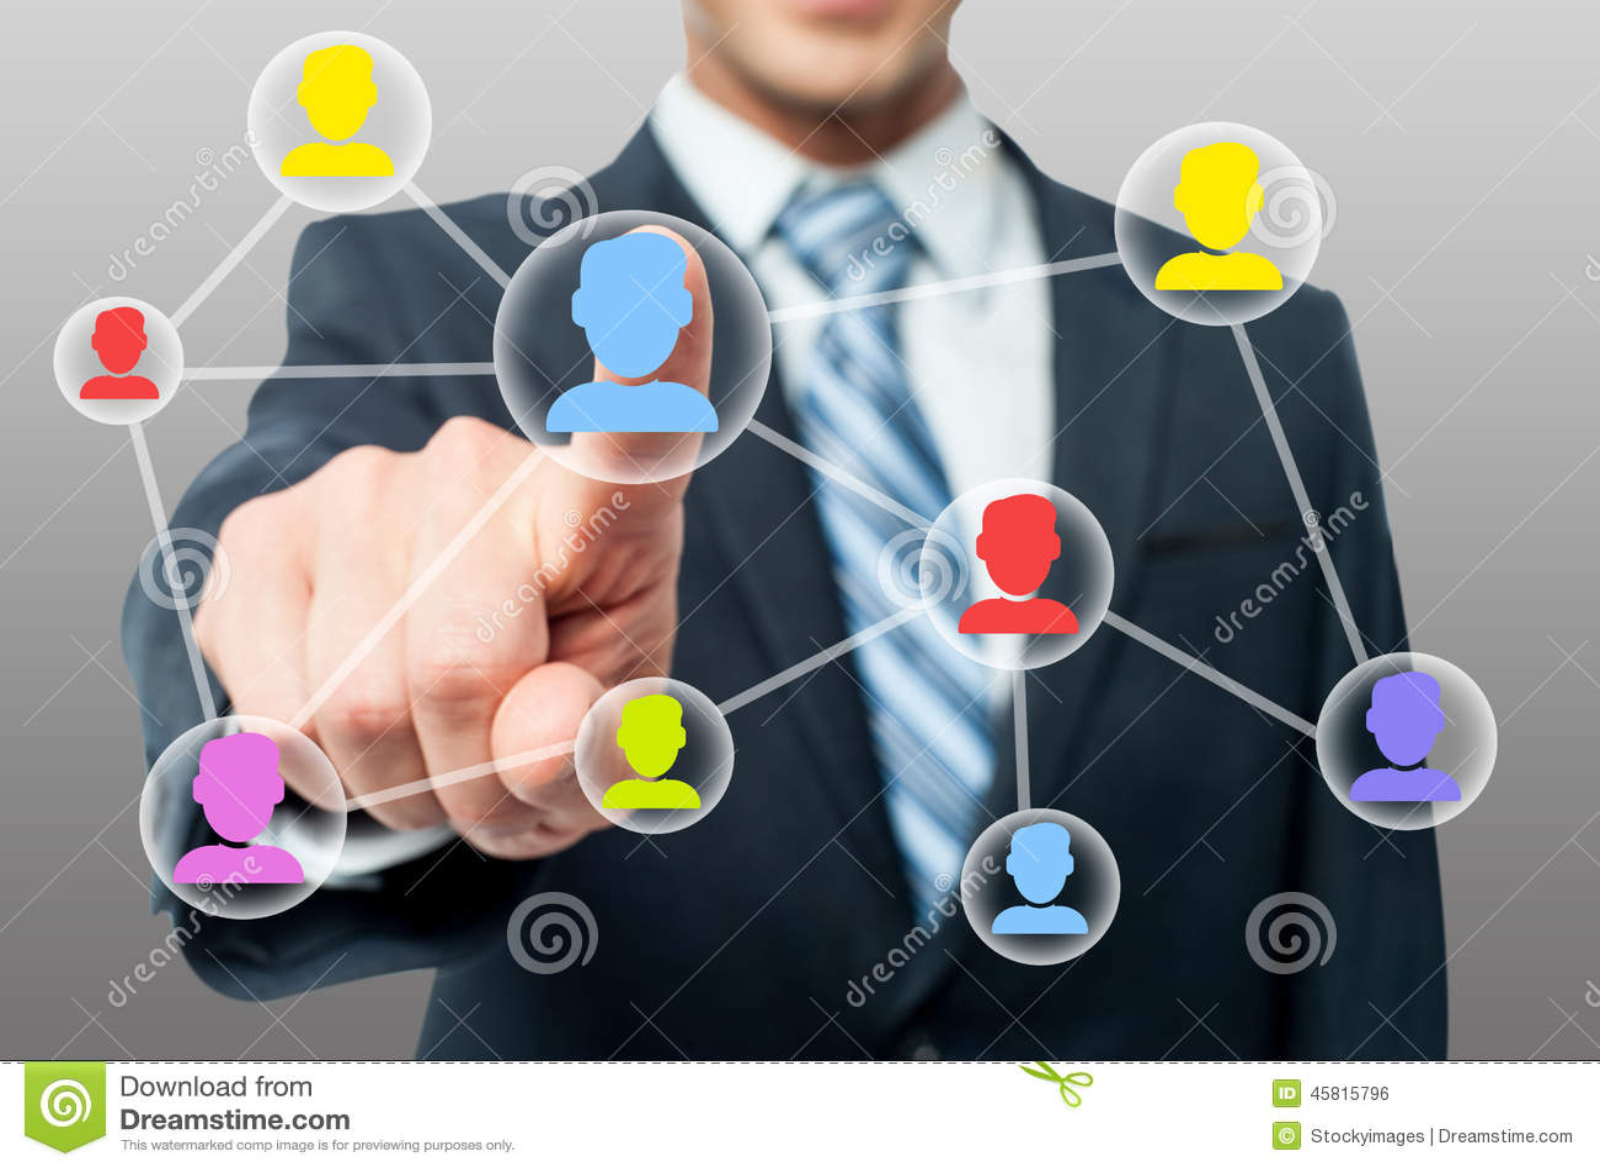 Man hand pressing contact on virtual screen